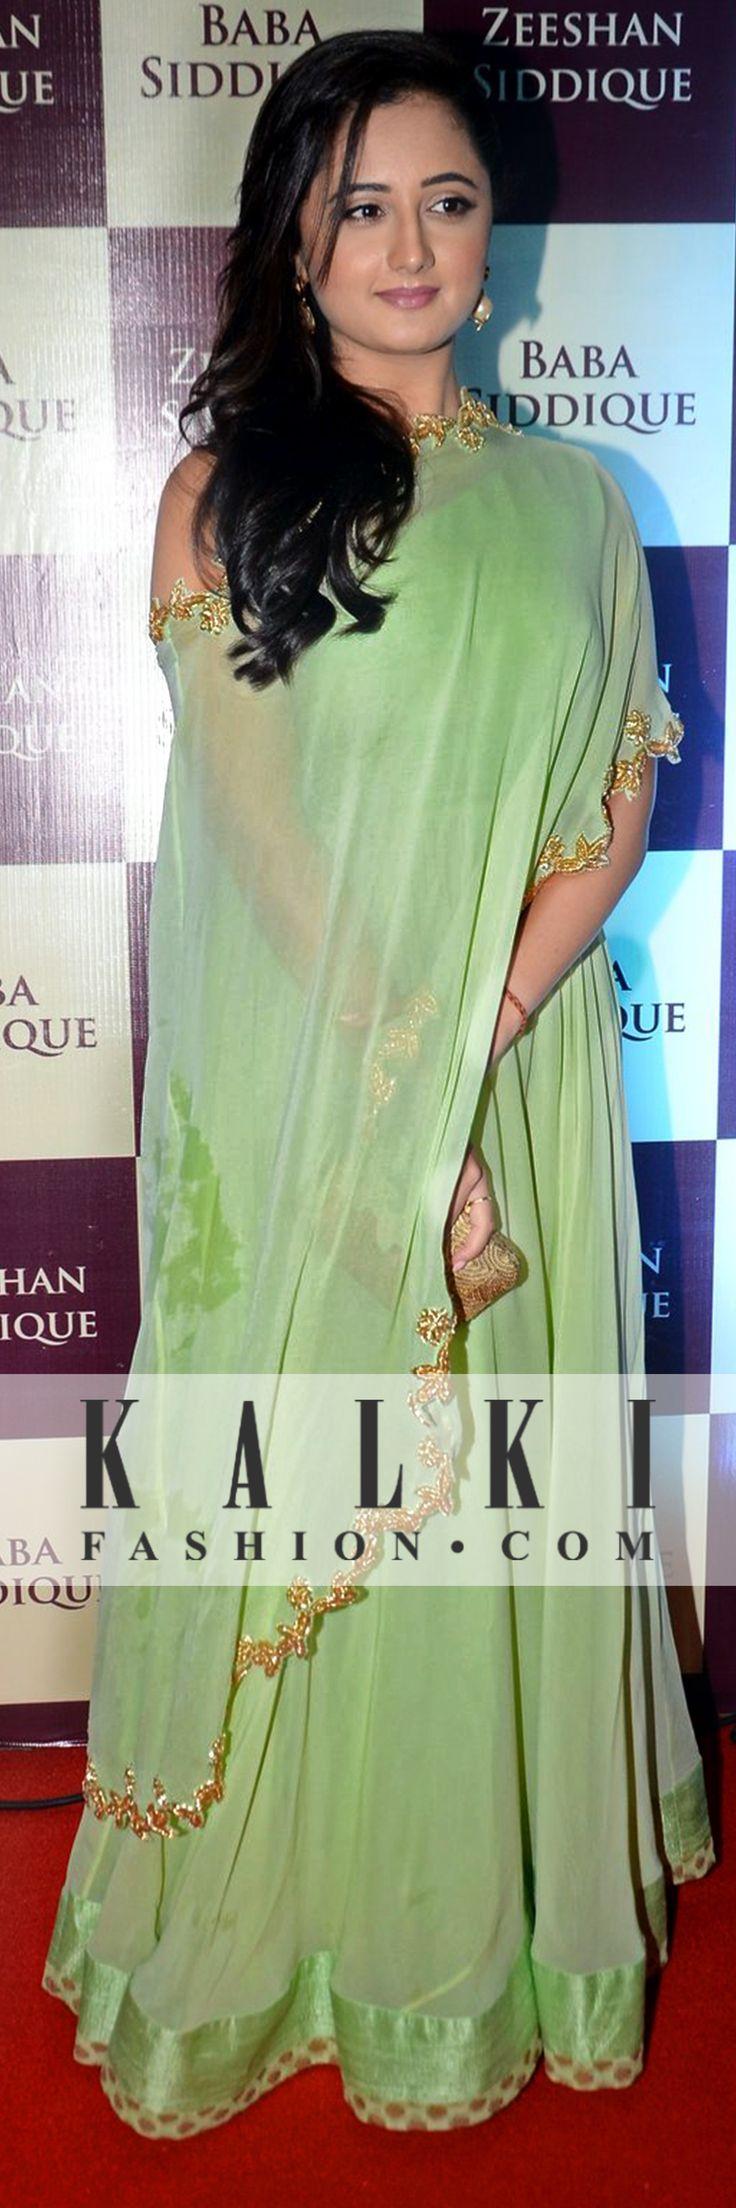 Dressed in a light green drop shoulder floor length dress with golden work, Rashmi was seen dazzling in style